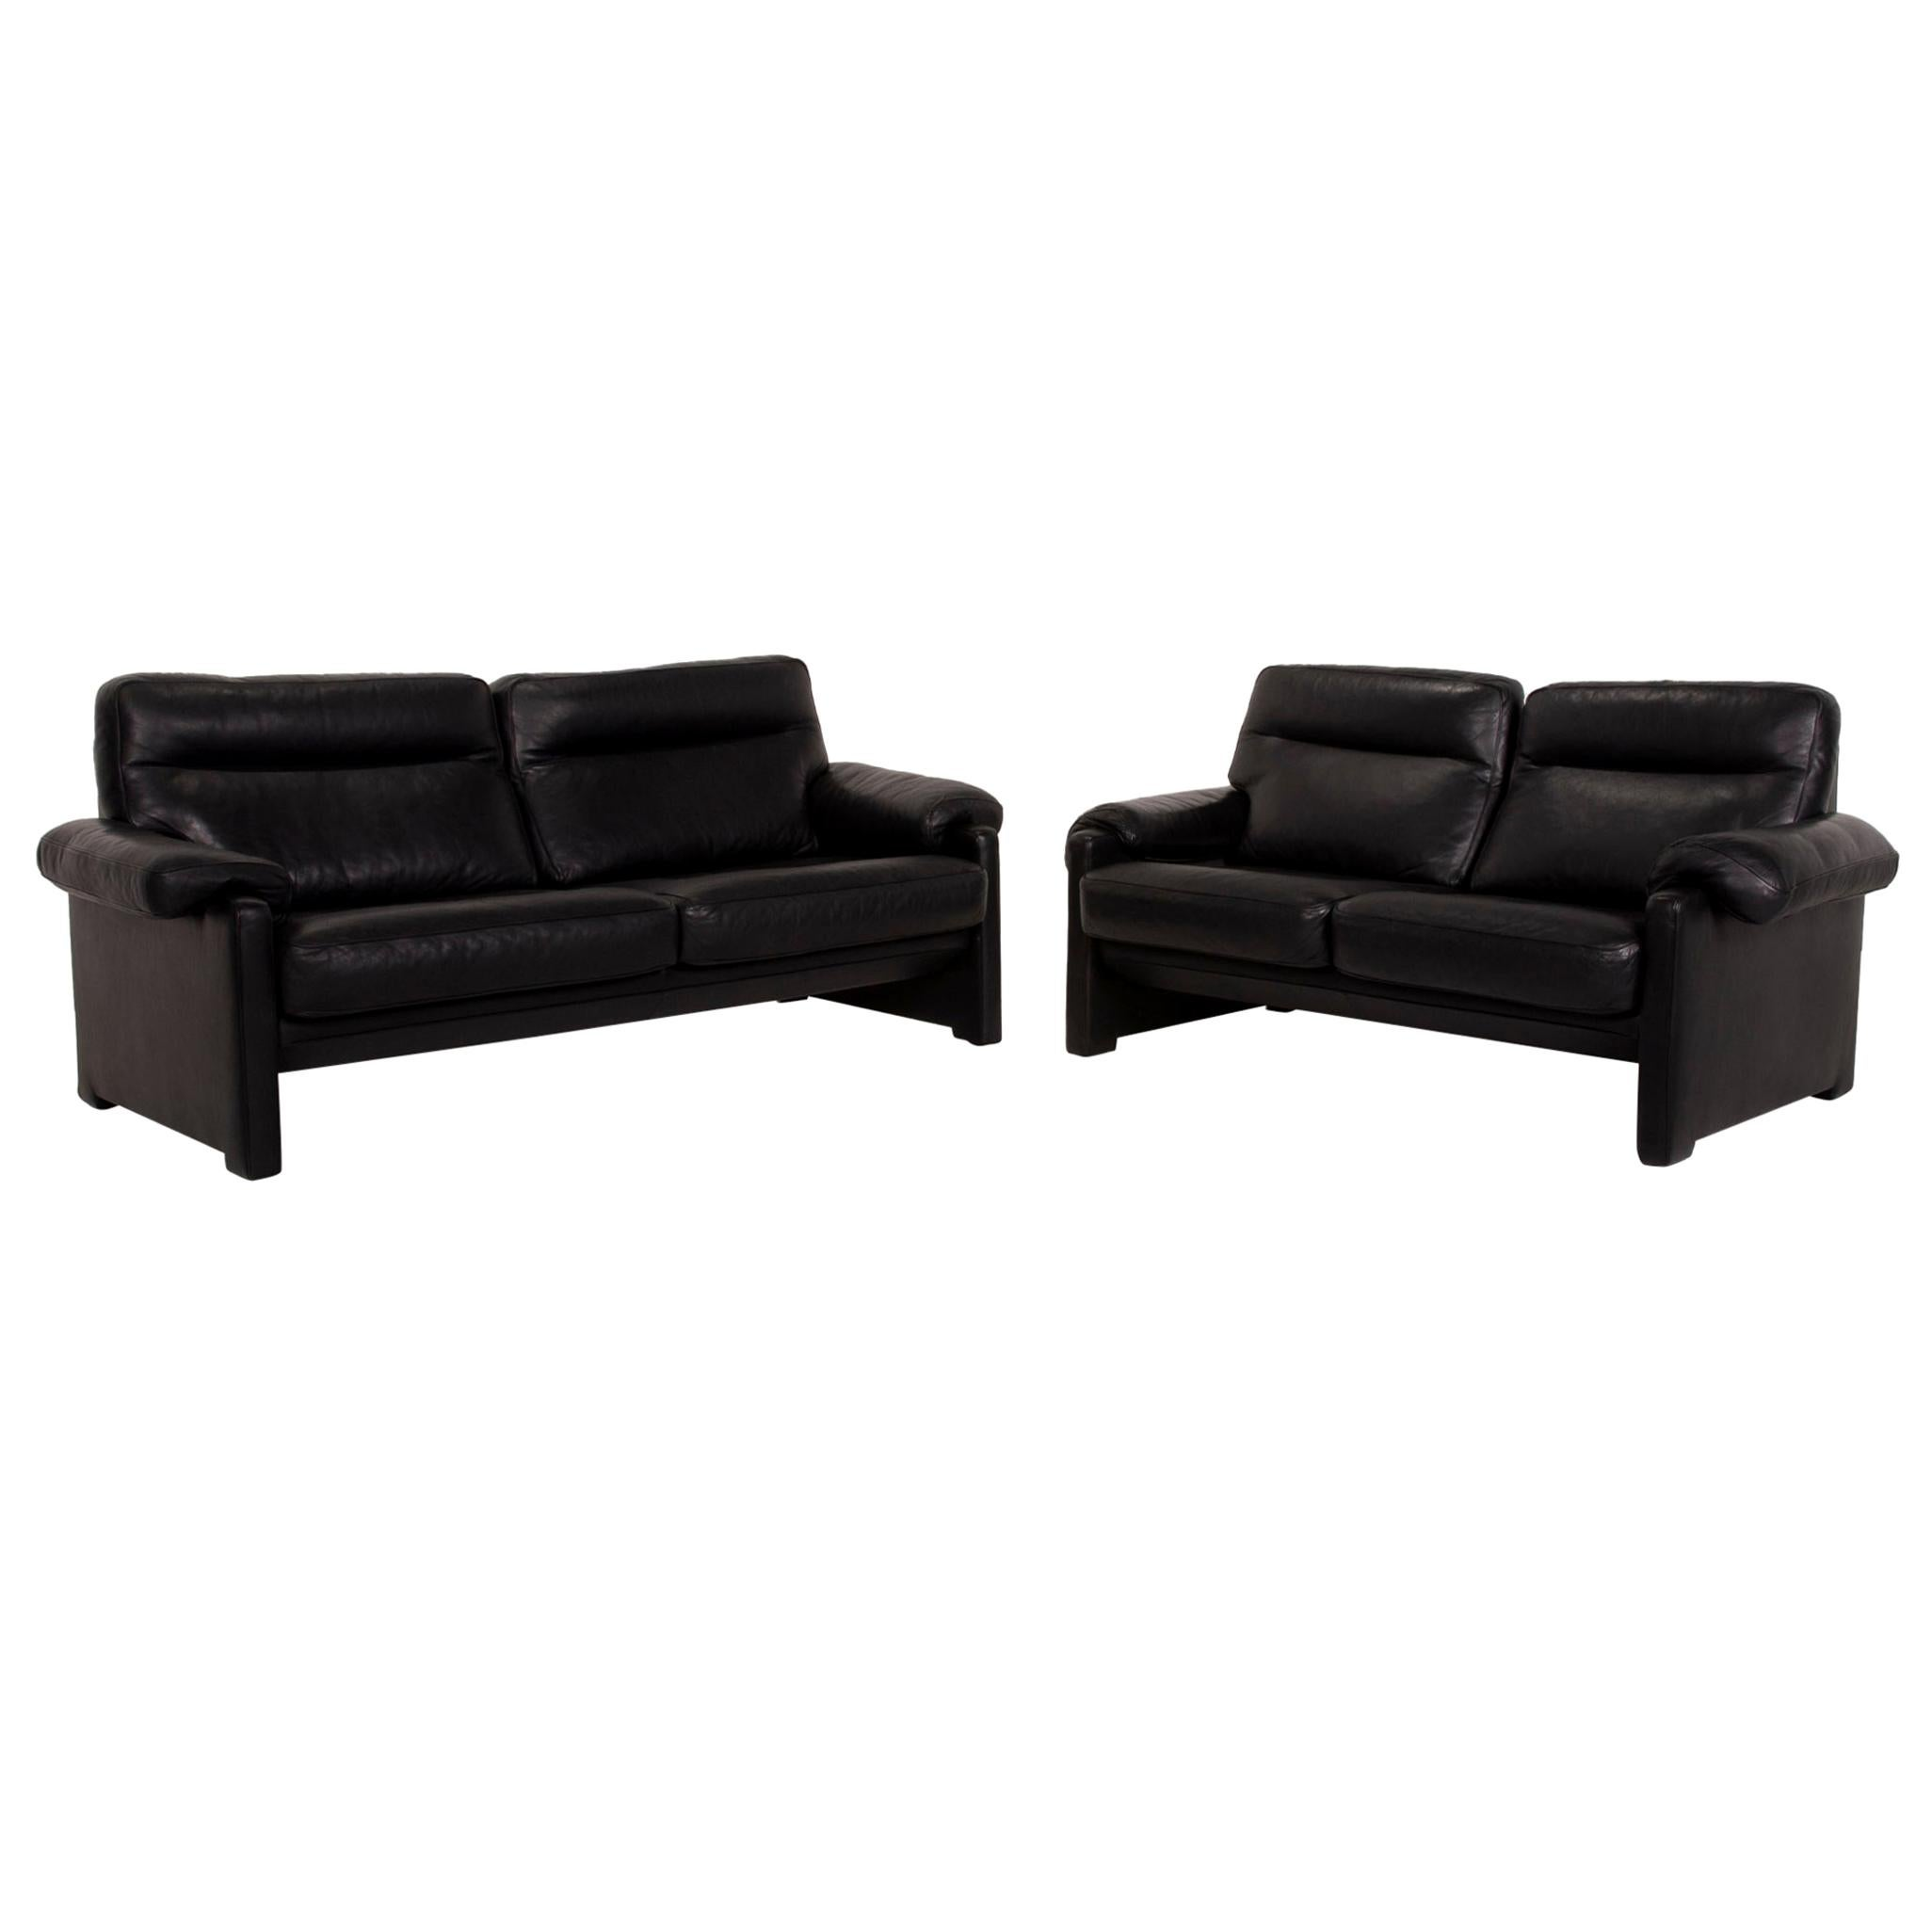 De Sede Ds 70 Leather Sofa Set Black 1x Three-Seater 1x Two-Seater Set